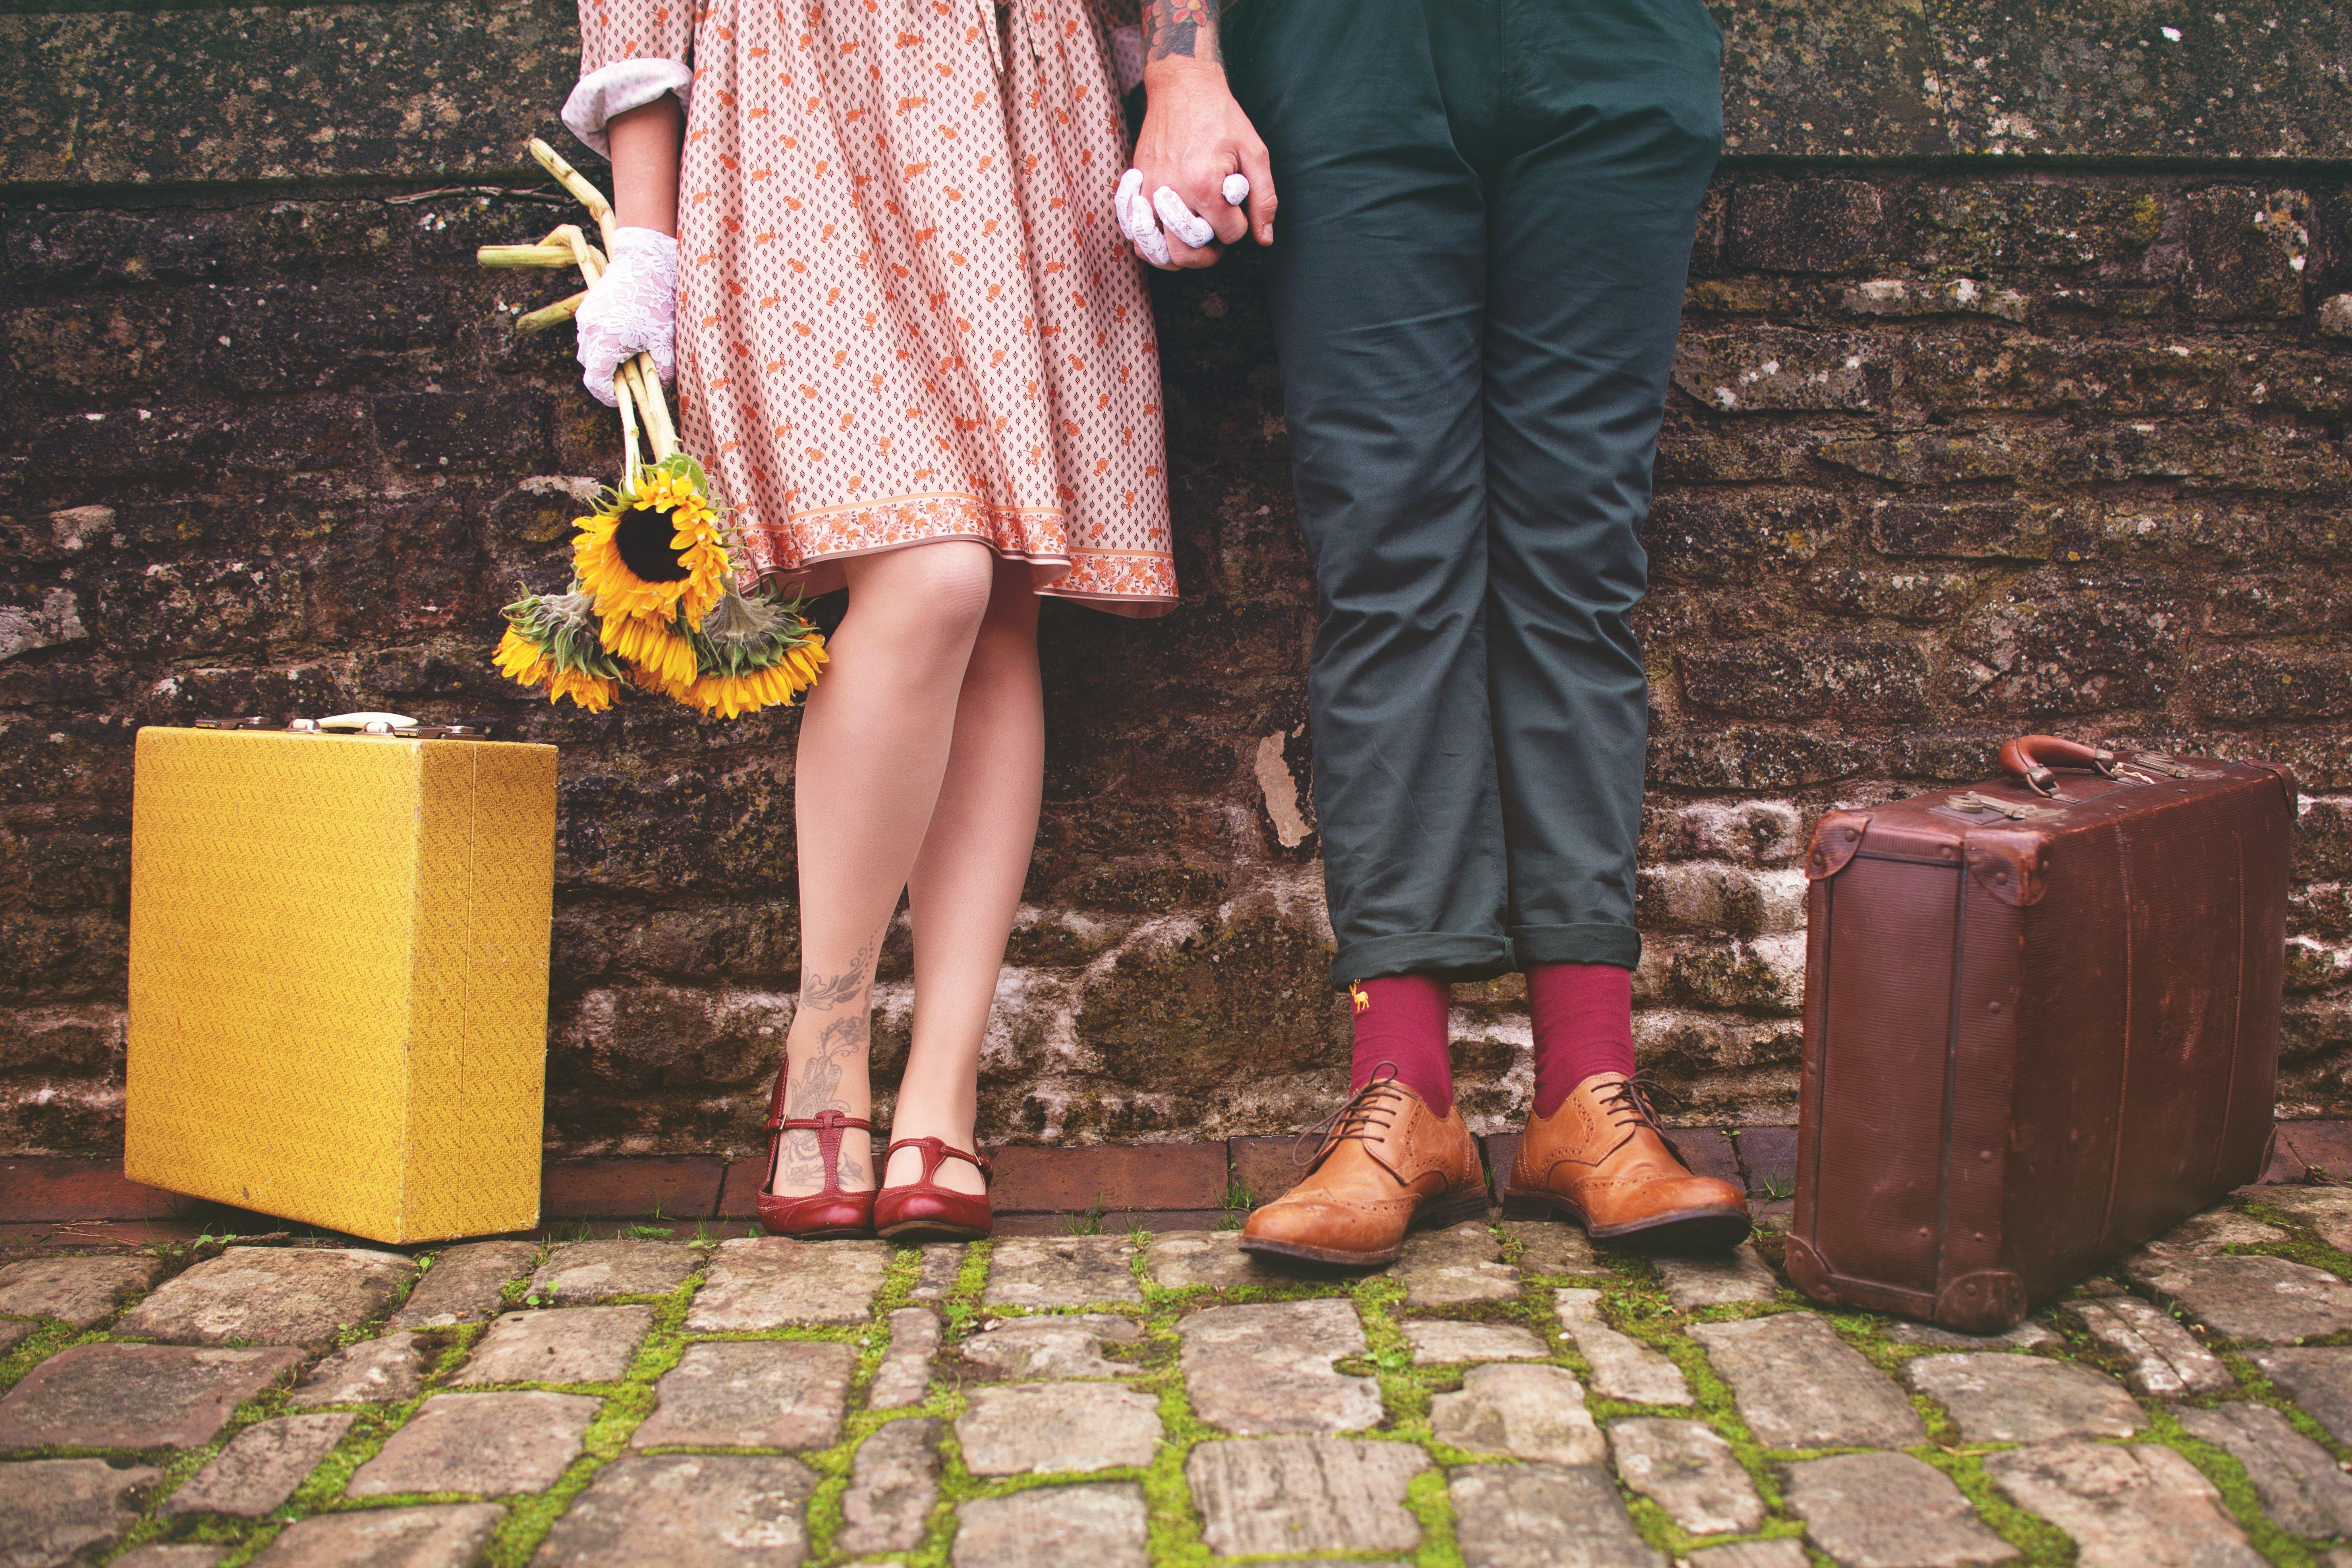 Color Palette – couple romantic together vintage –  #4d3f37, #e9c5bd, #cda06b, #98755c, #aca854 – Paco color, Congo color, White Oak color, Tangara color, Spinach Banana Smoothie color